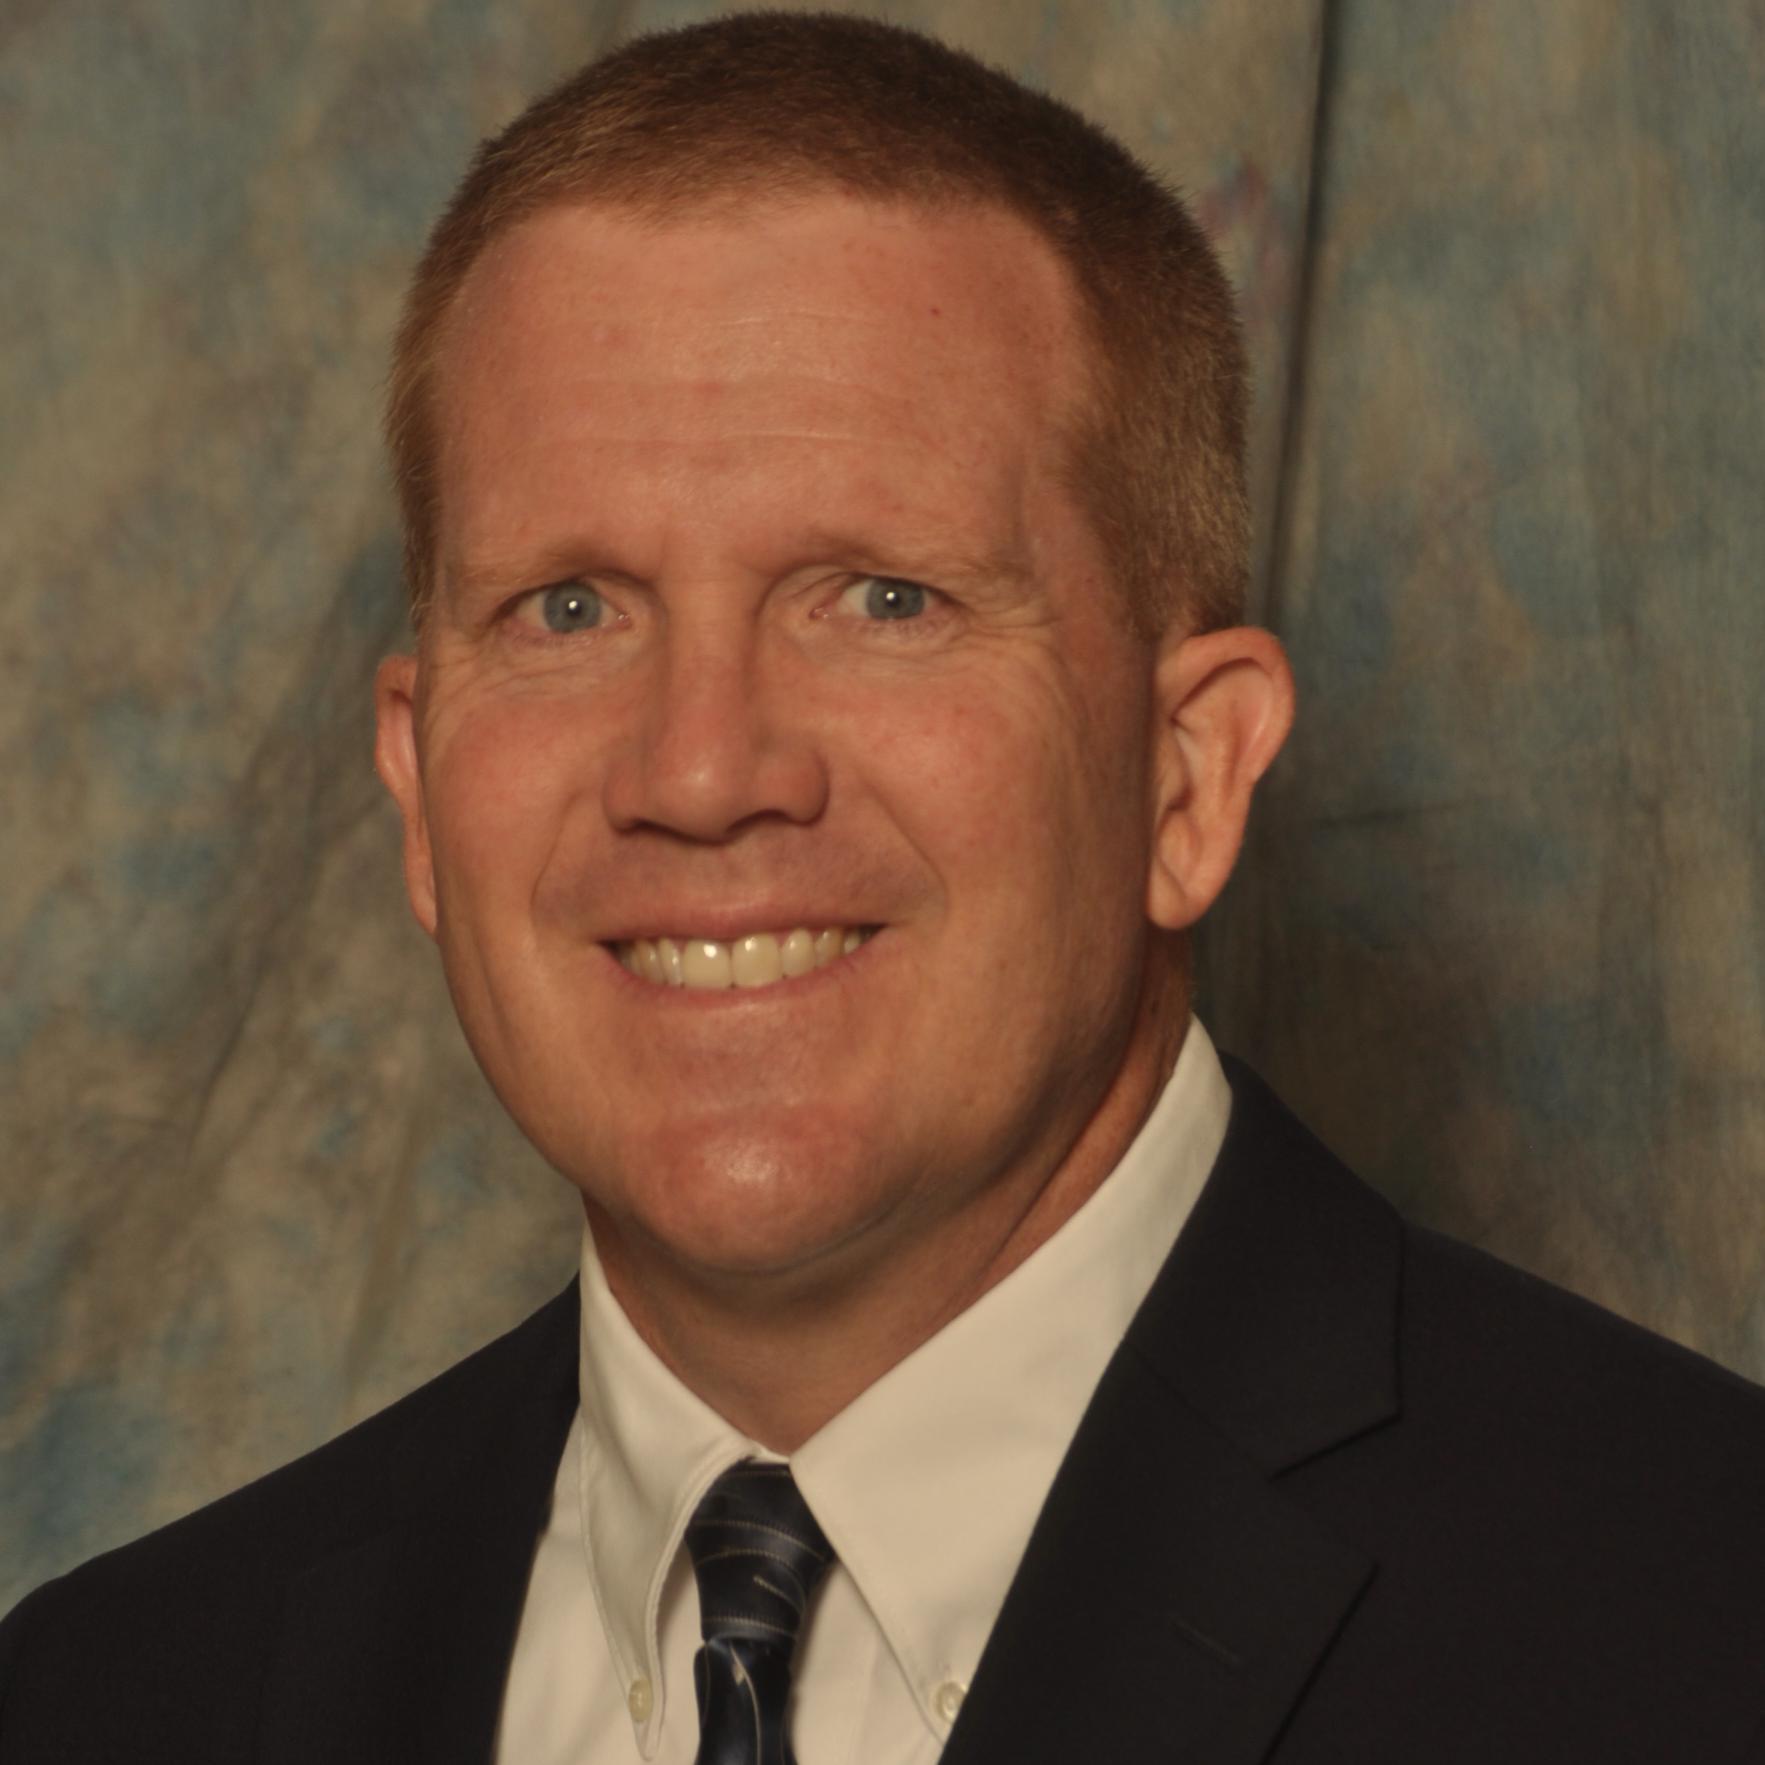 Mr. Joey Carr, Armorel Elementary Principal